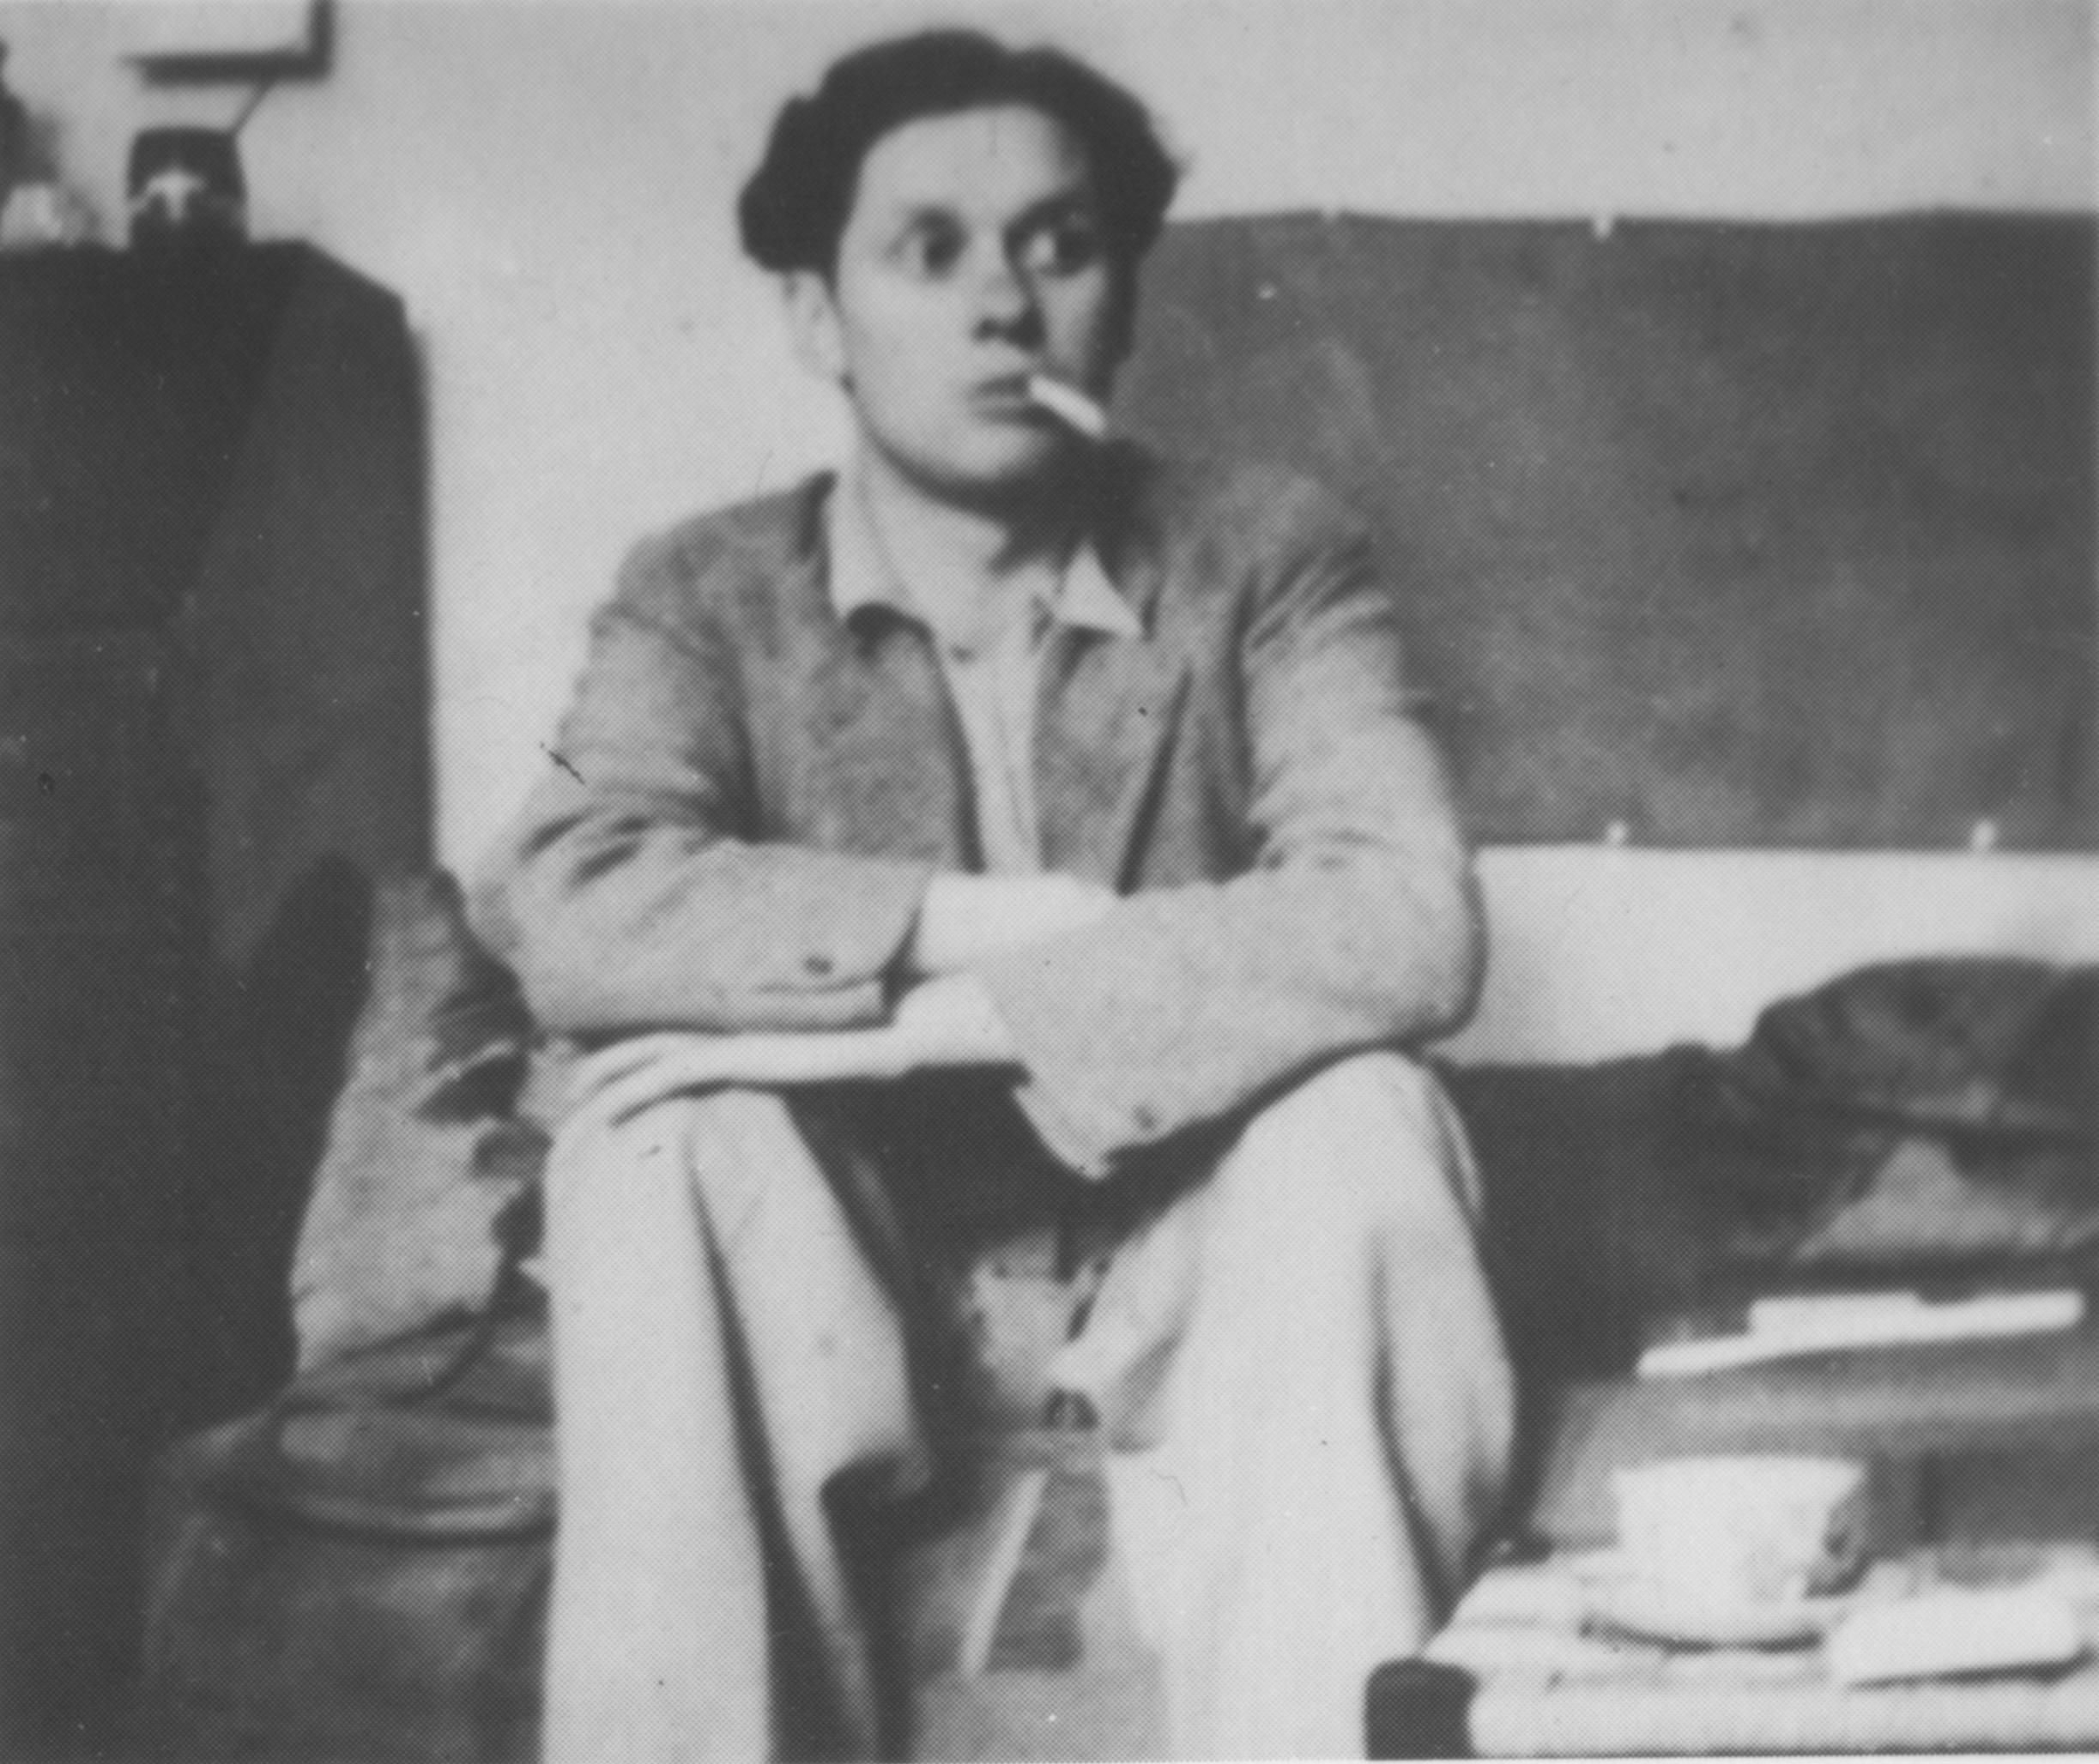 Dylan1936